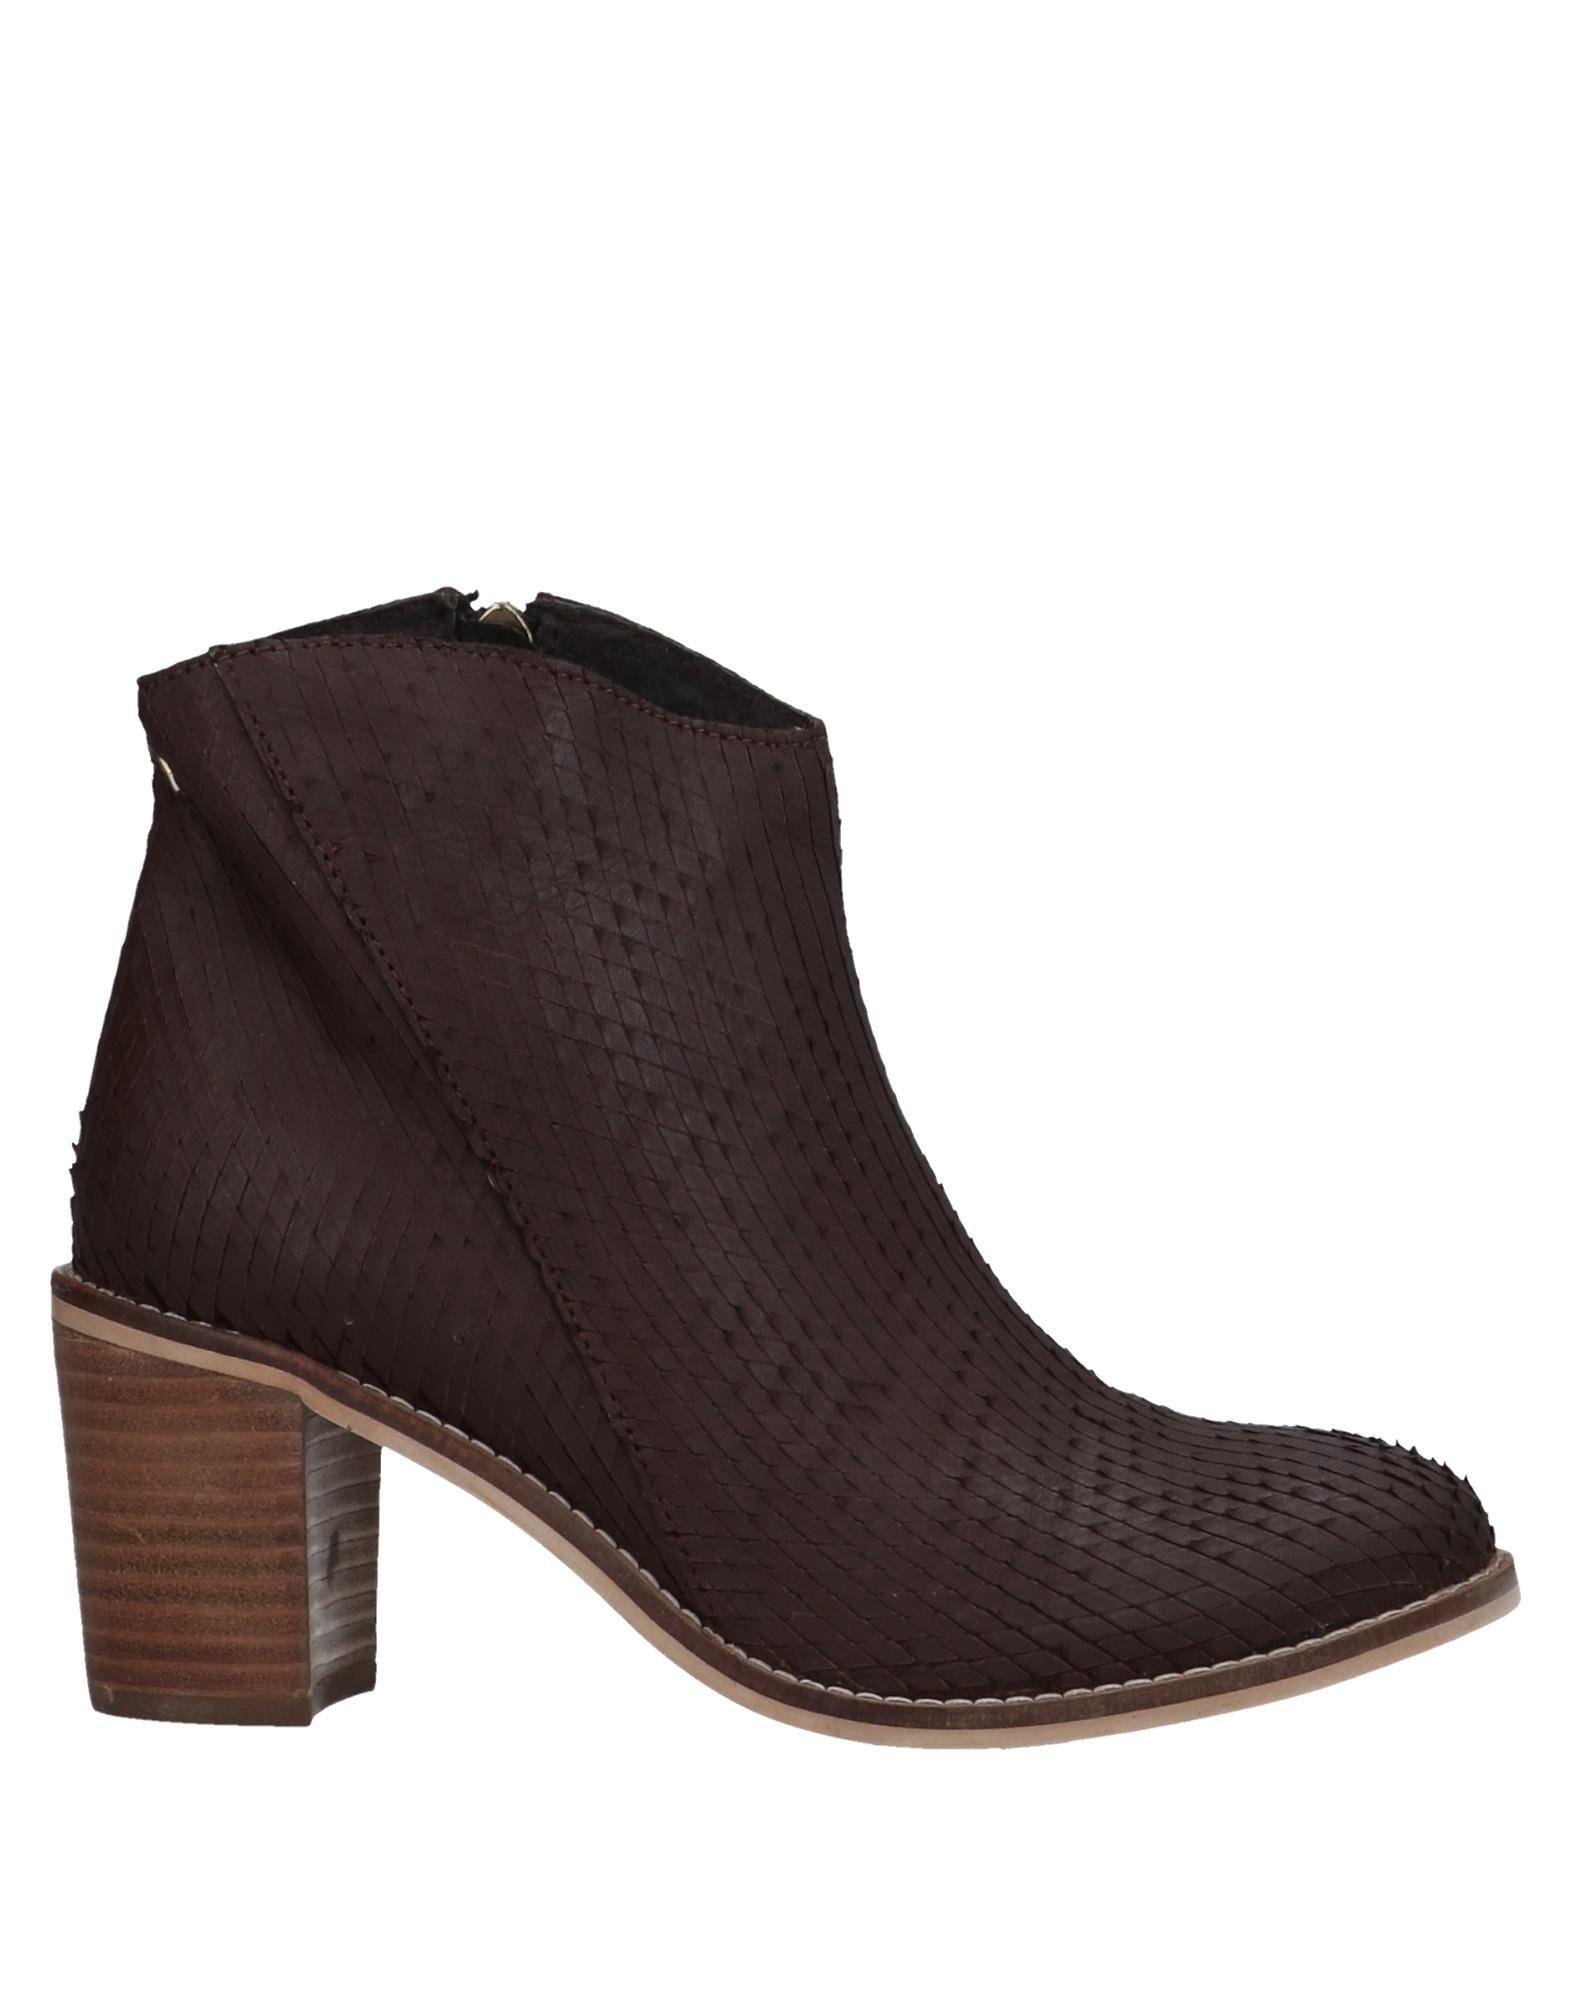 Cuplé Stiefelette Gute Damen  11541269GD Gute Stiefelette Qualität beliebte Schuhe 747a8b